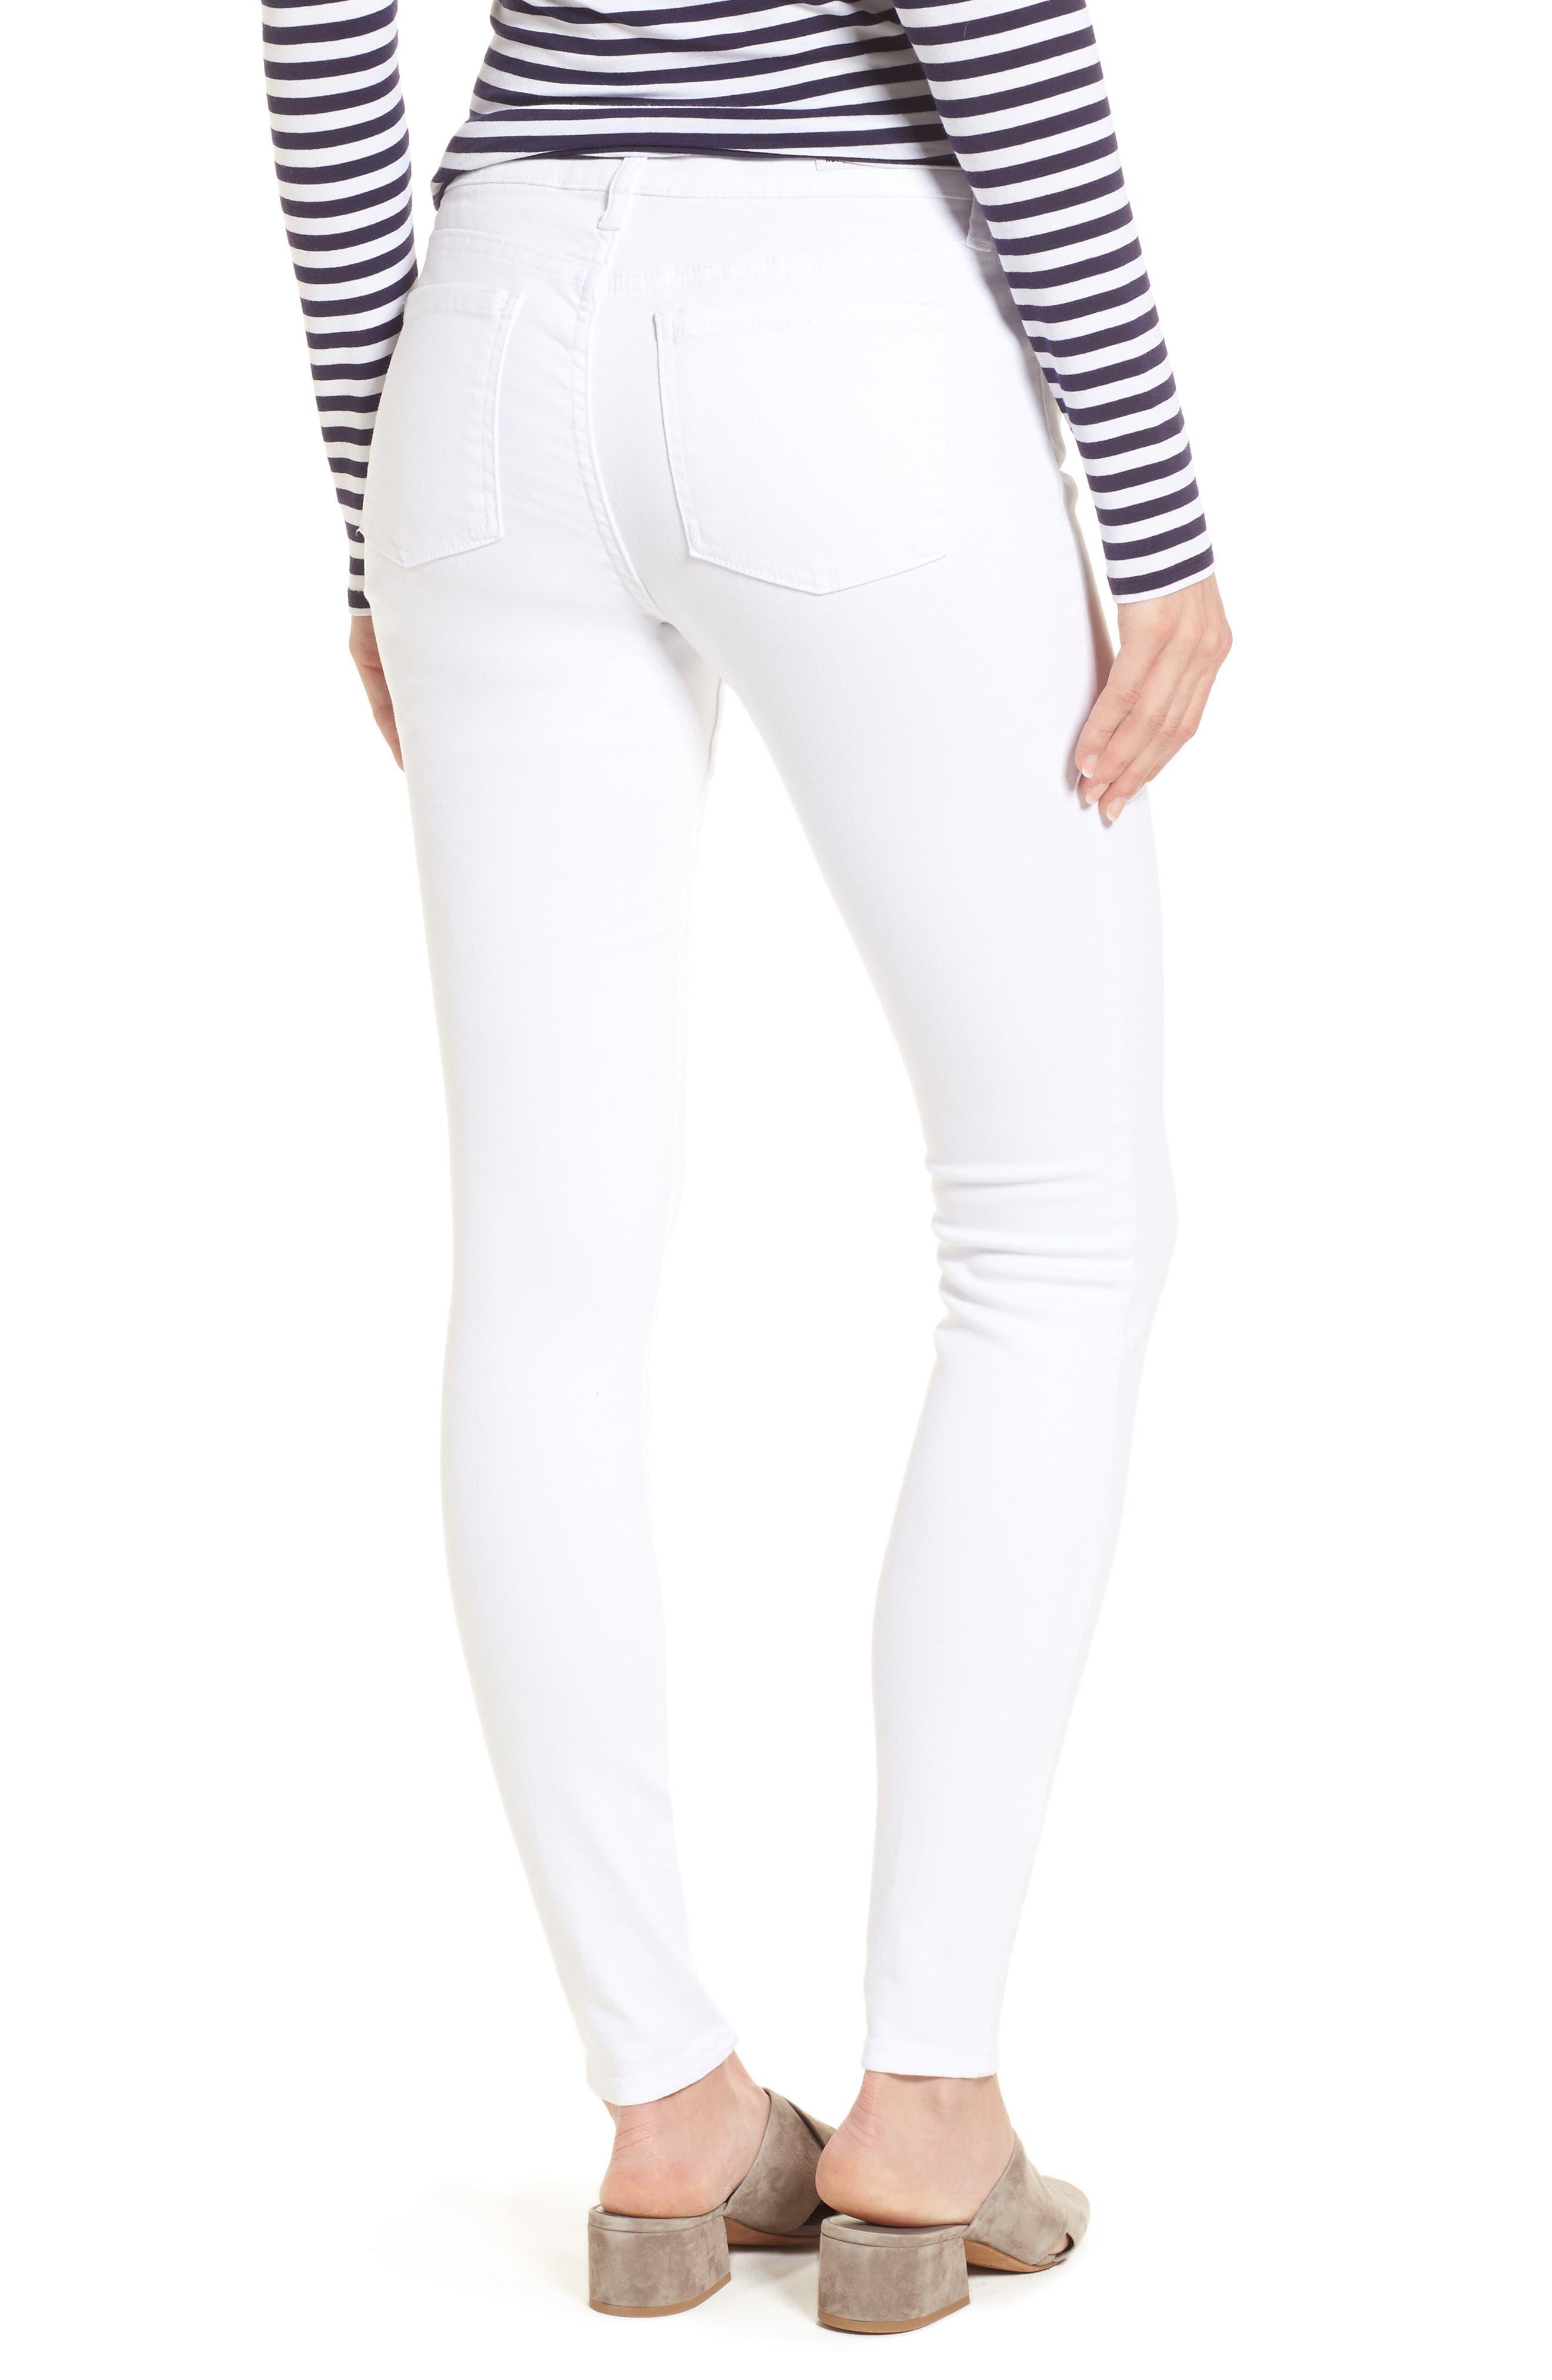 Mia Skinny Jeans,                             Alternate thumbnail 2, color,                             Optic White